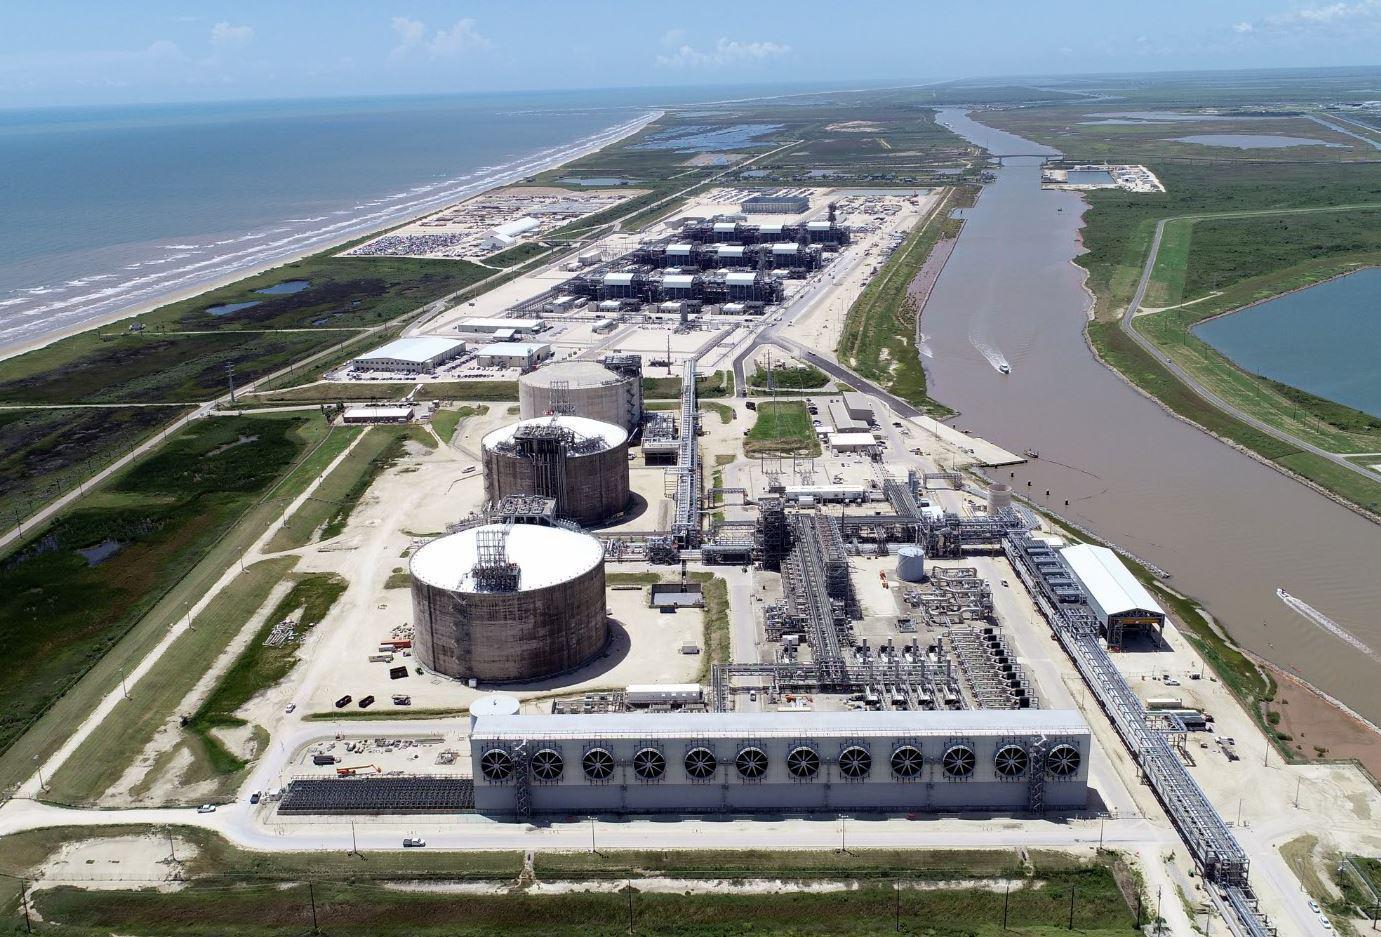 Exporting natural gas creates carbon footprint rivaling that of coal, data shows